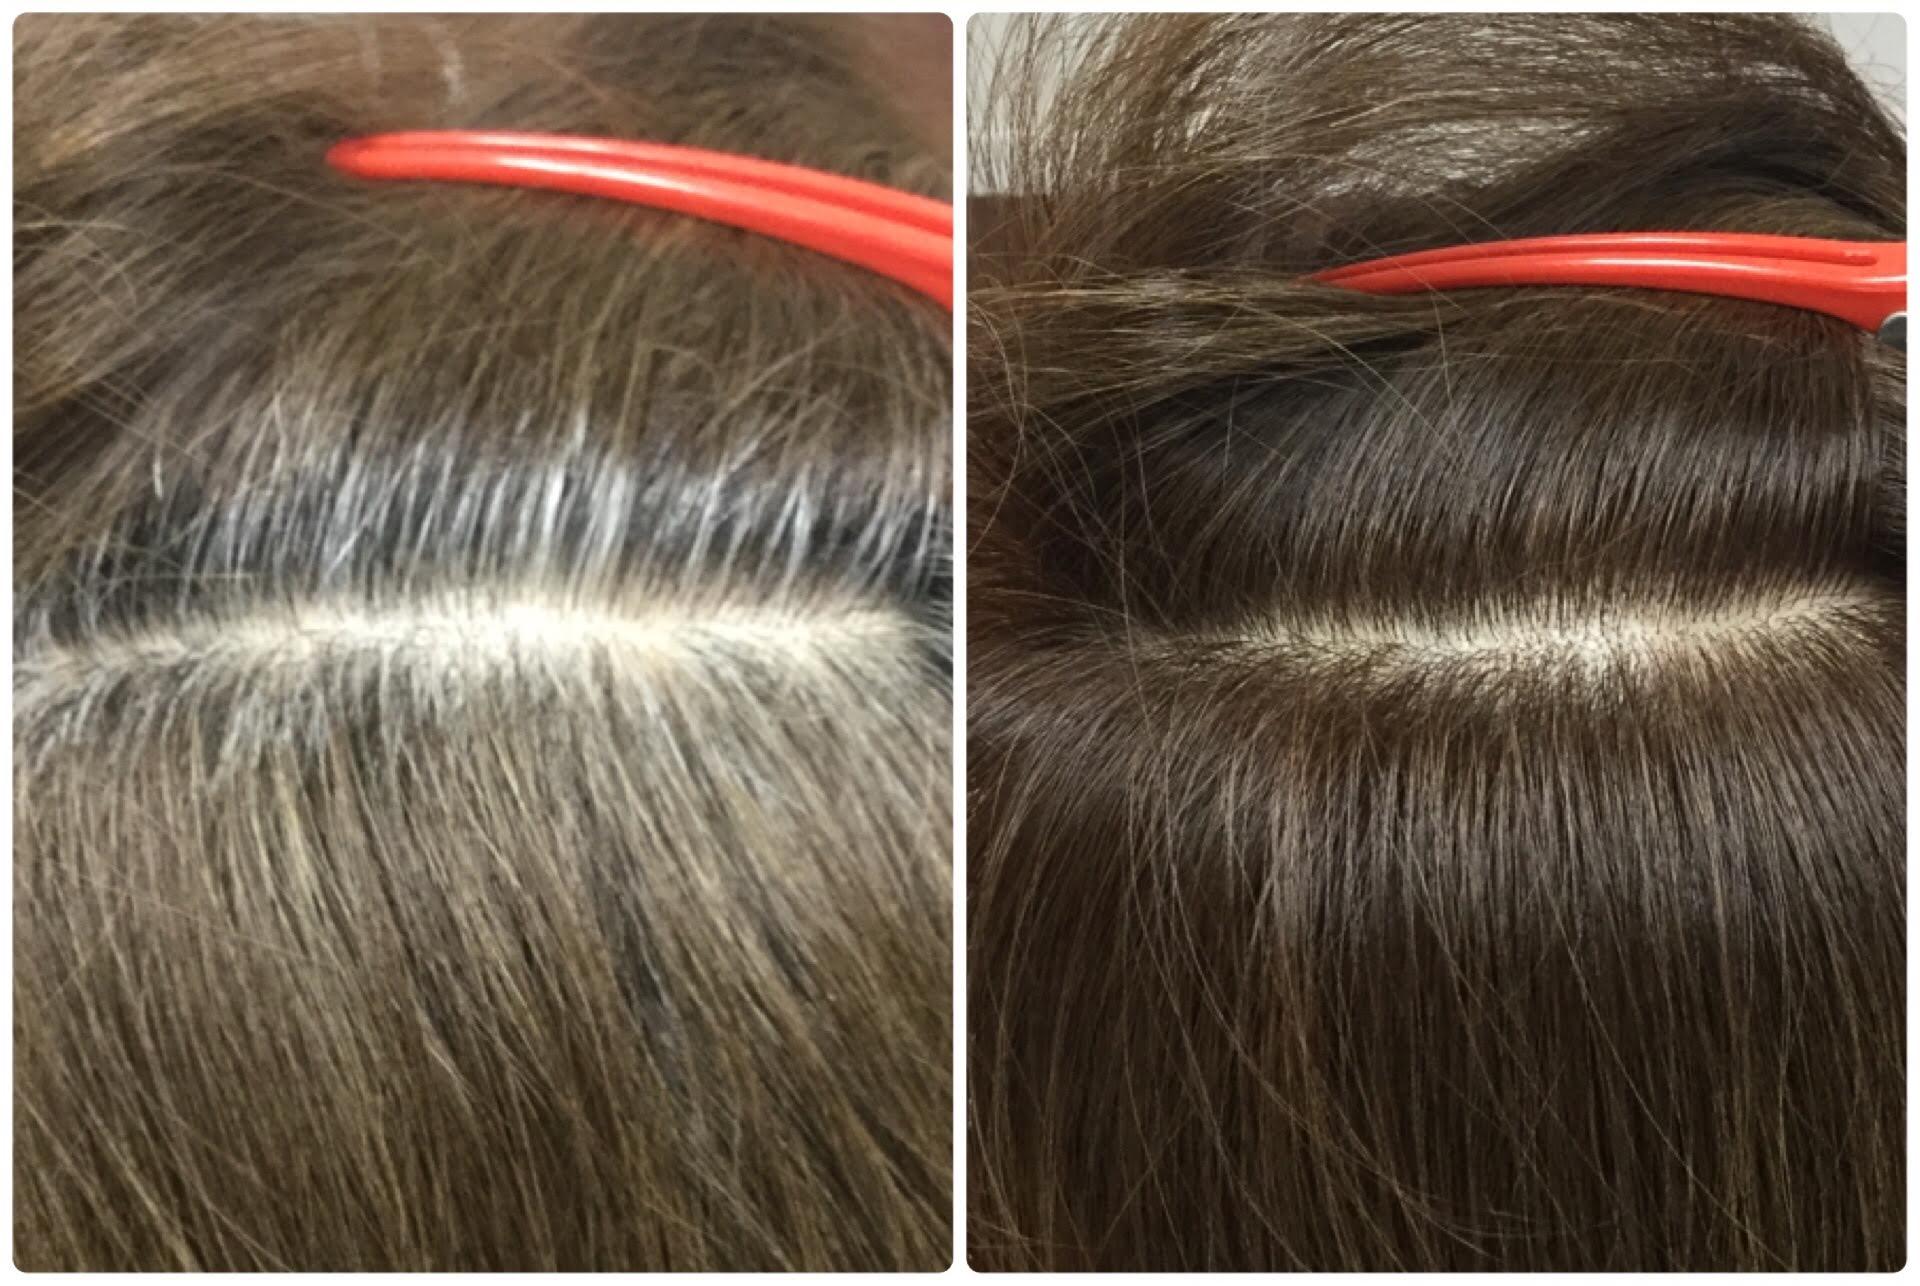 I大人女性の為のグレイカラー【明るい白髪染め】神戸灘区六甲道からもくせ毛専門美容室アバディ